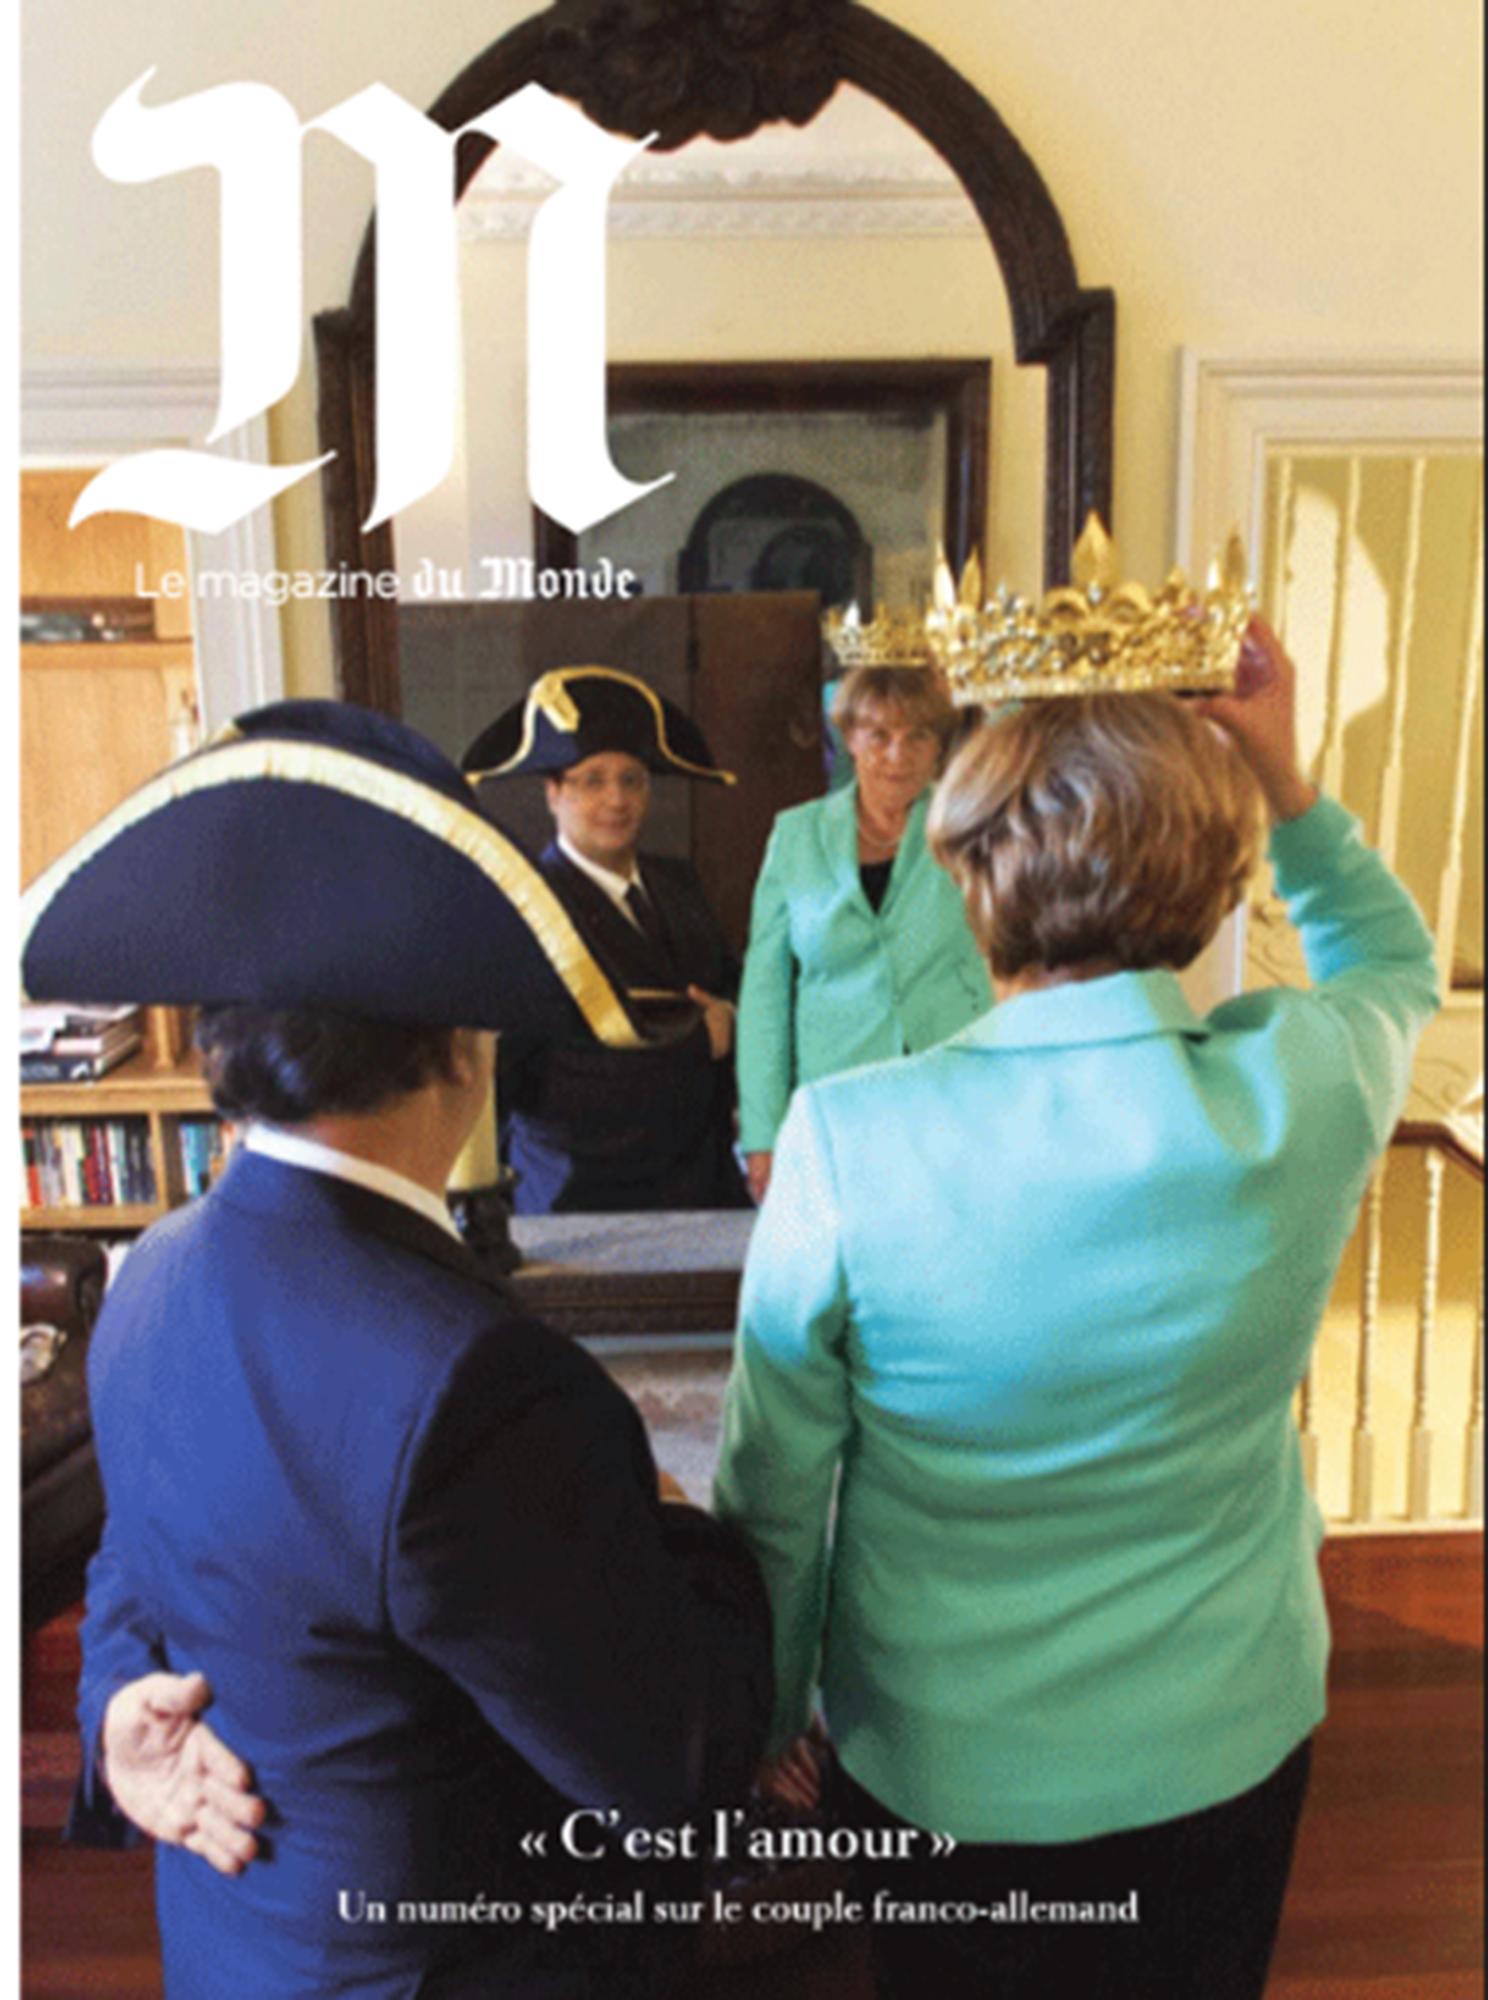 M_magazine_cover_Nov_2013.jpg